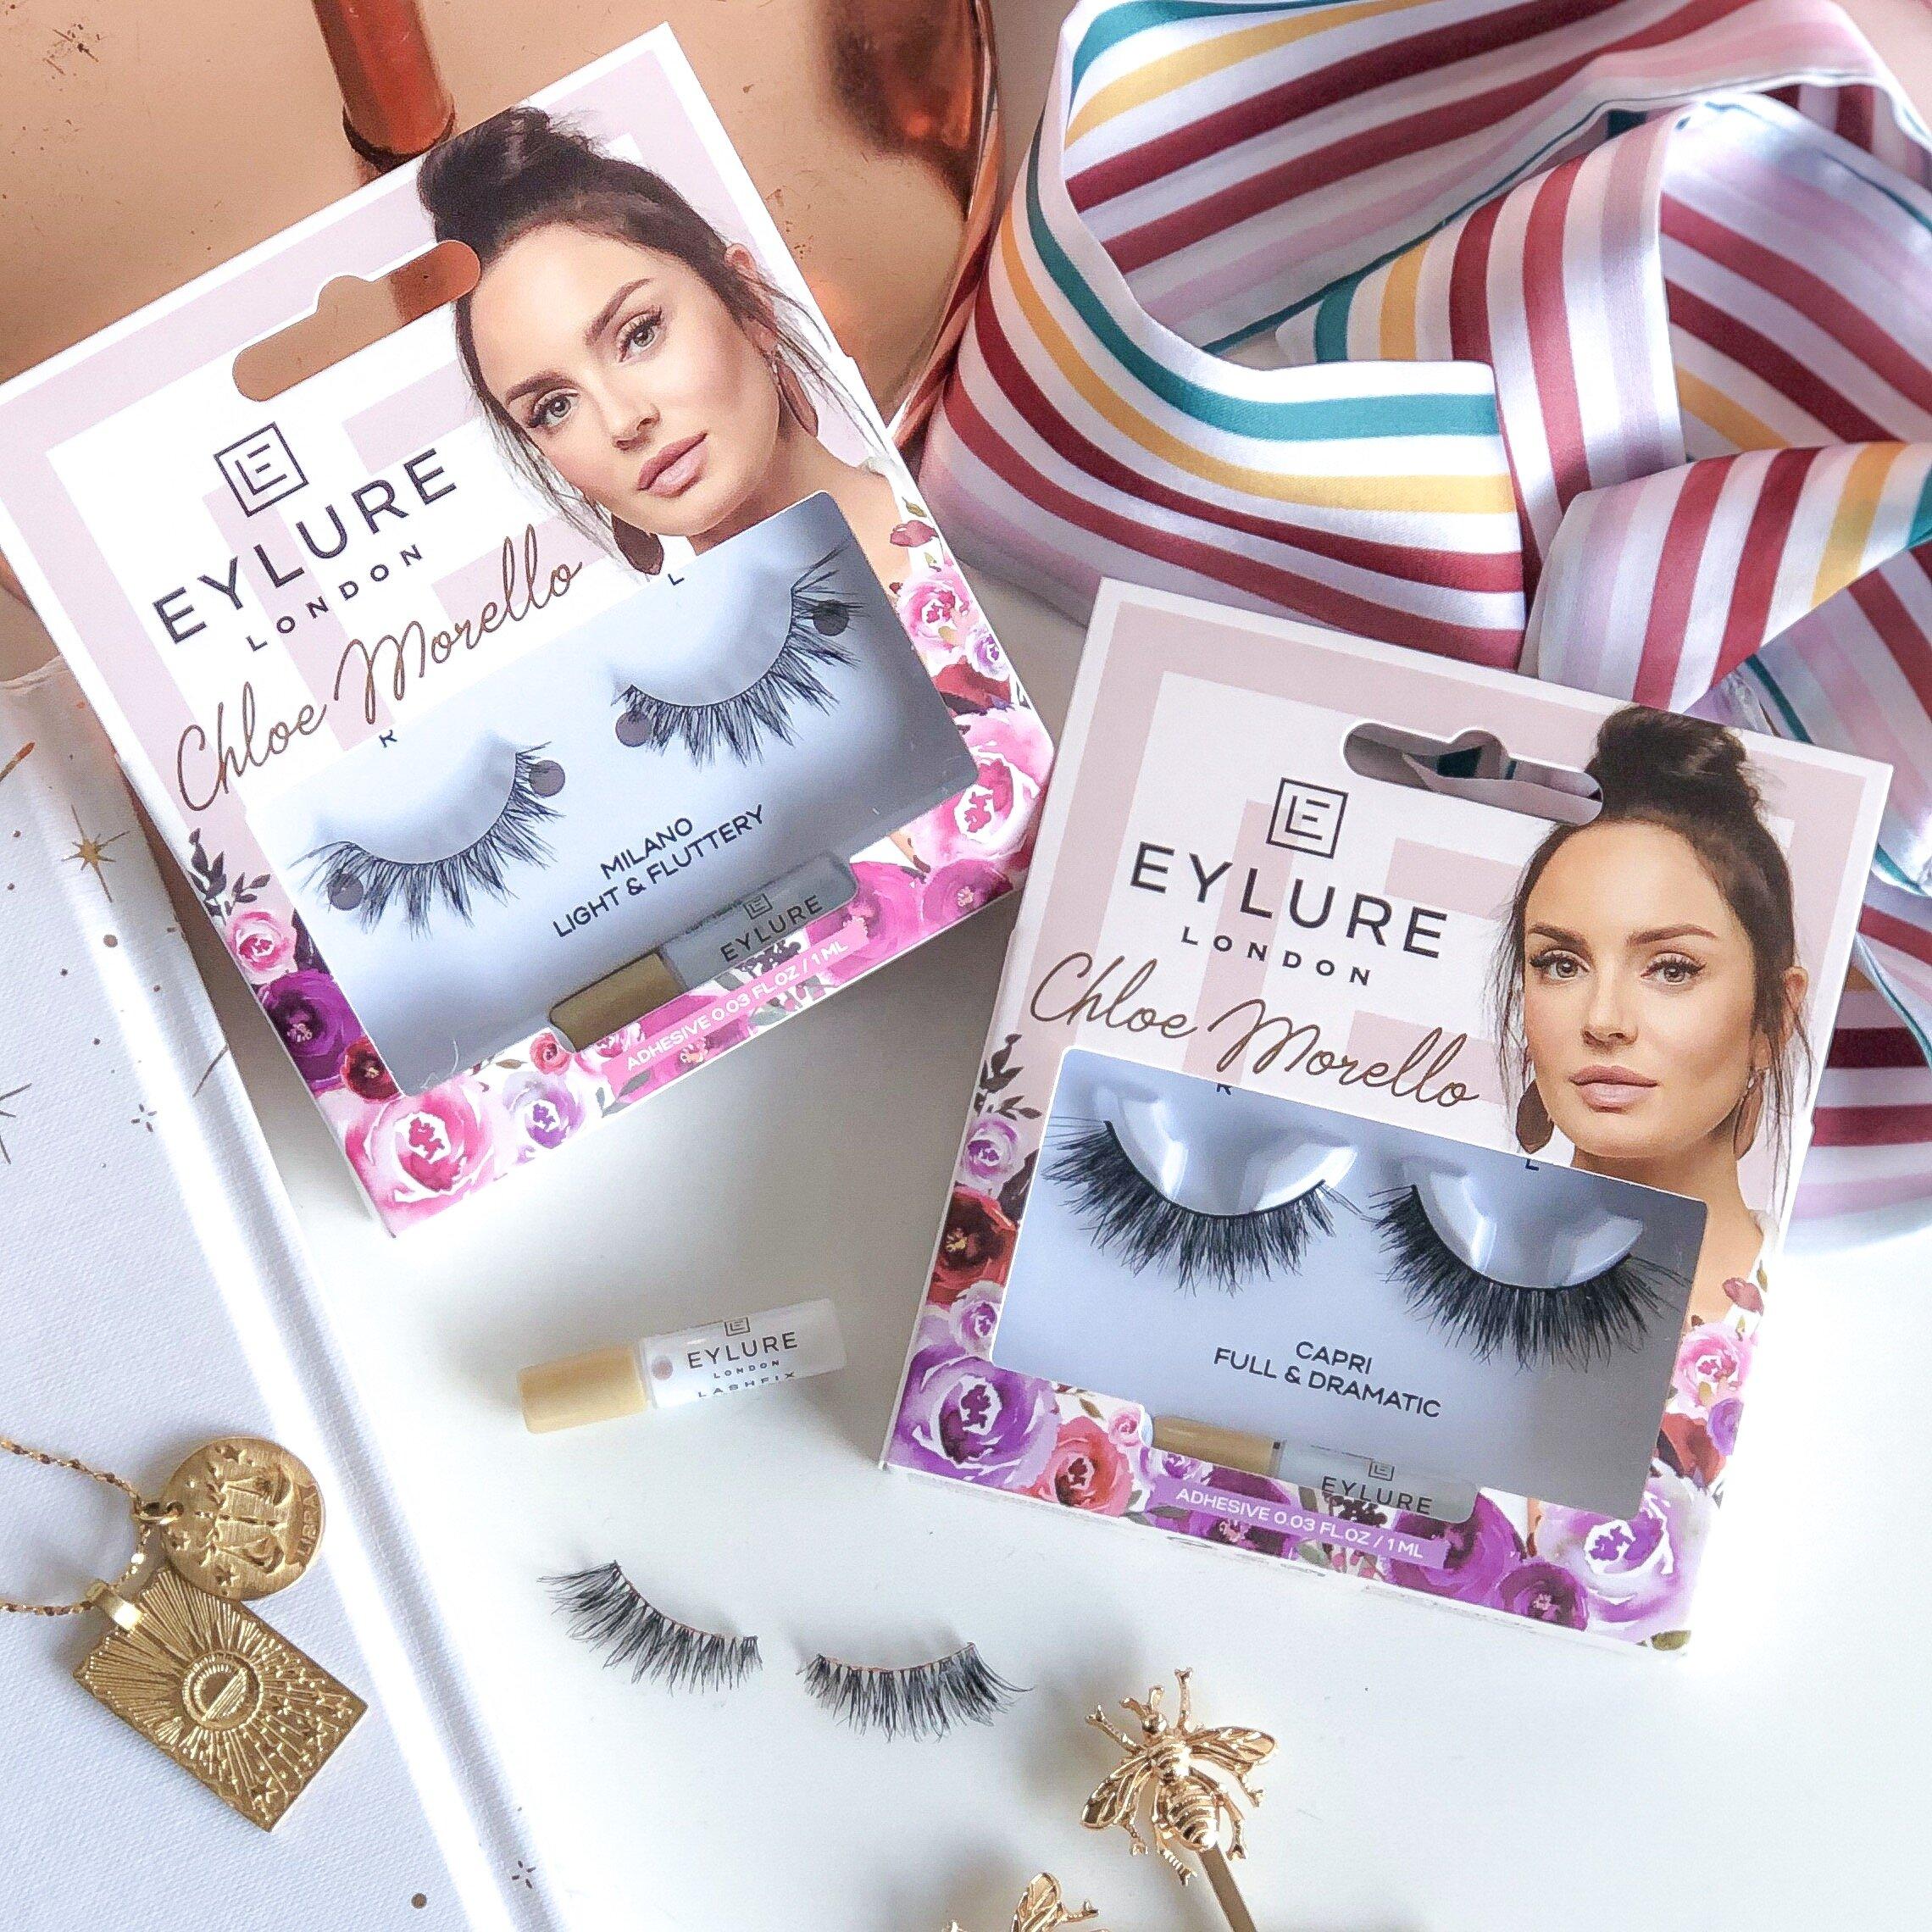 Eylure Lashes x Chloe Morello collection - Marisa Robinson Beauty